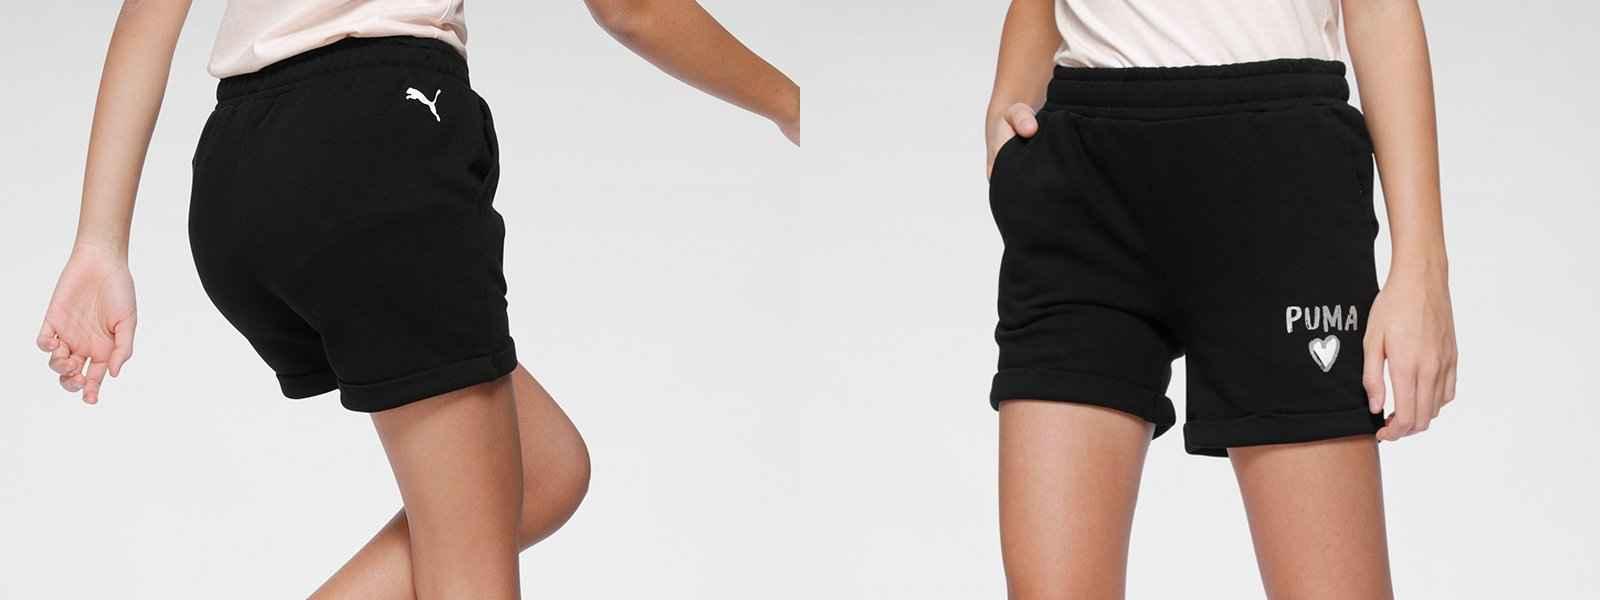 Mädchen-Sporthosen